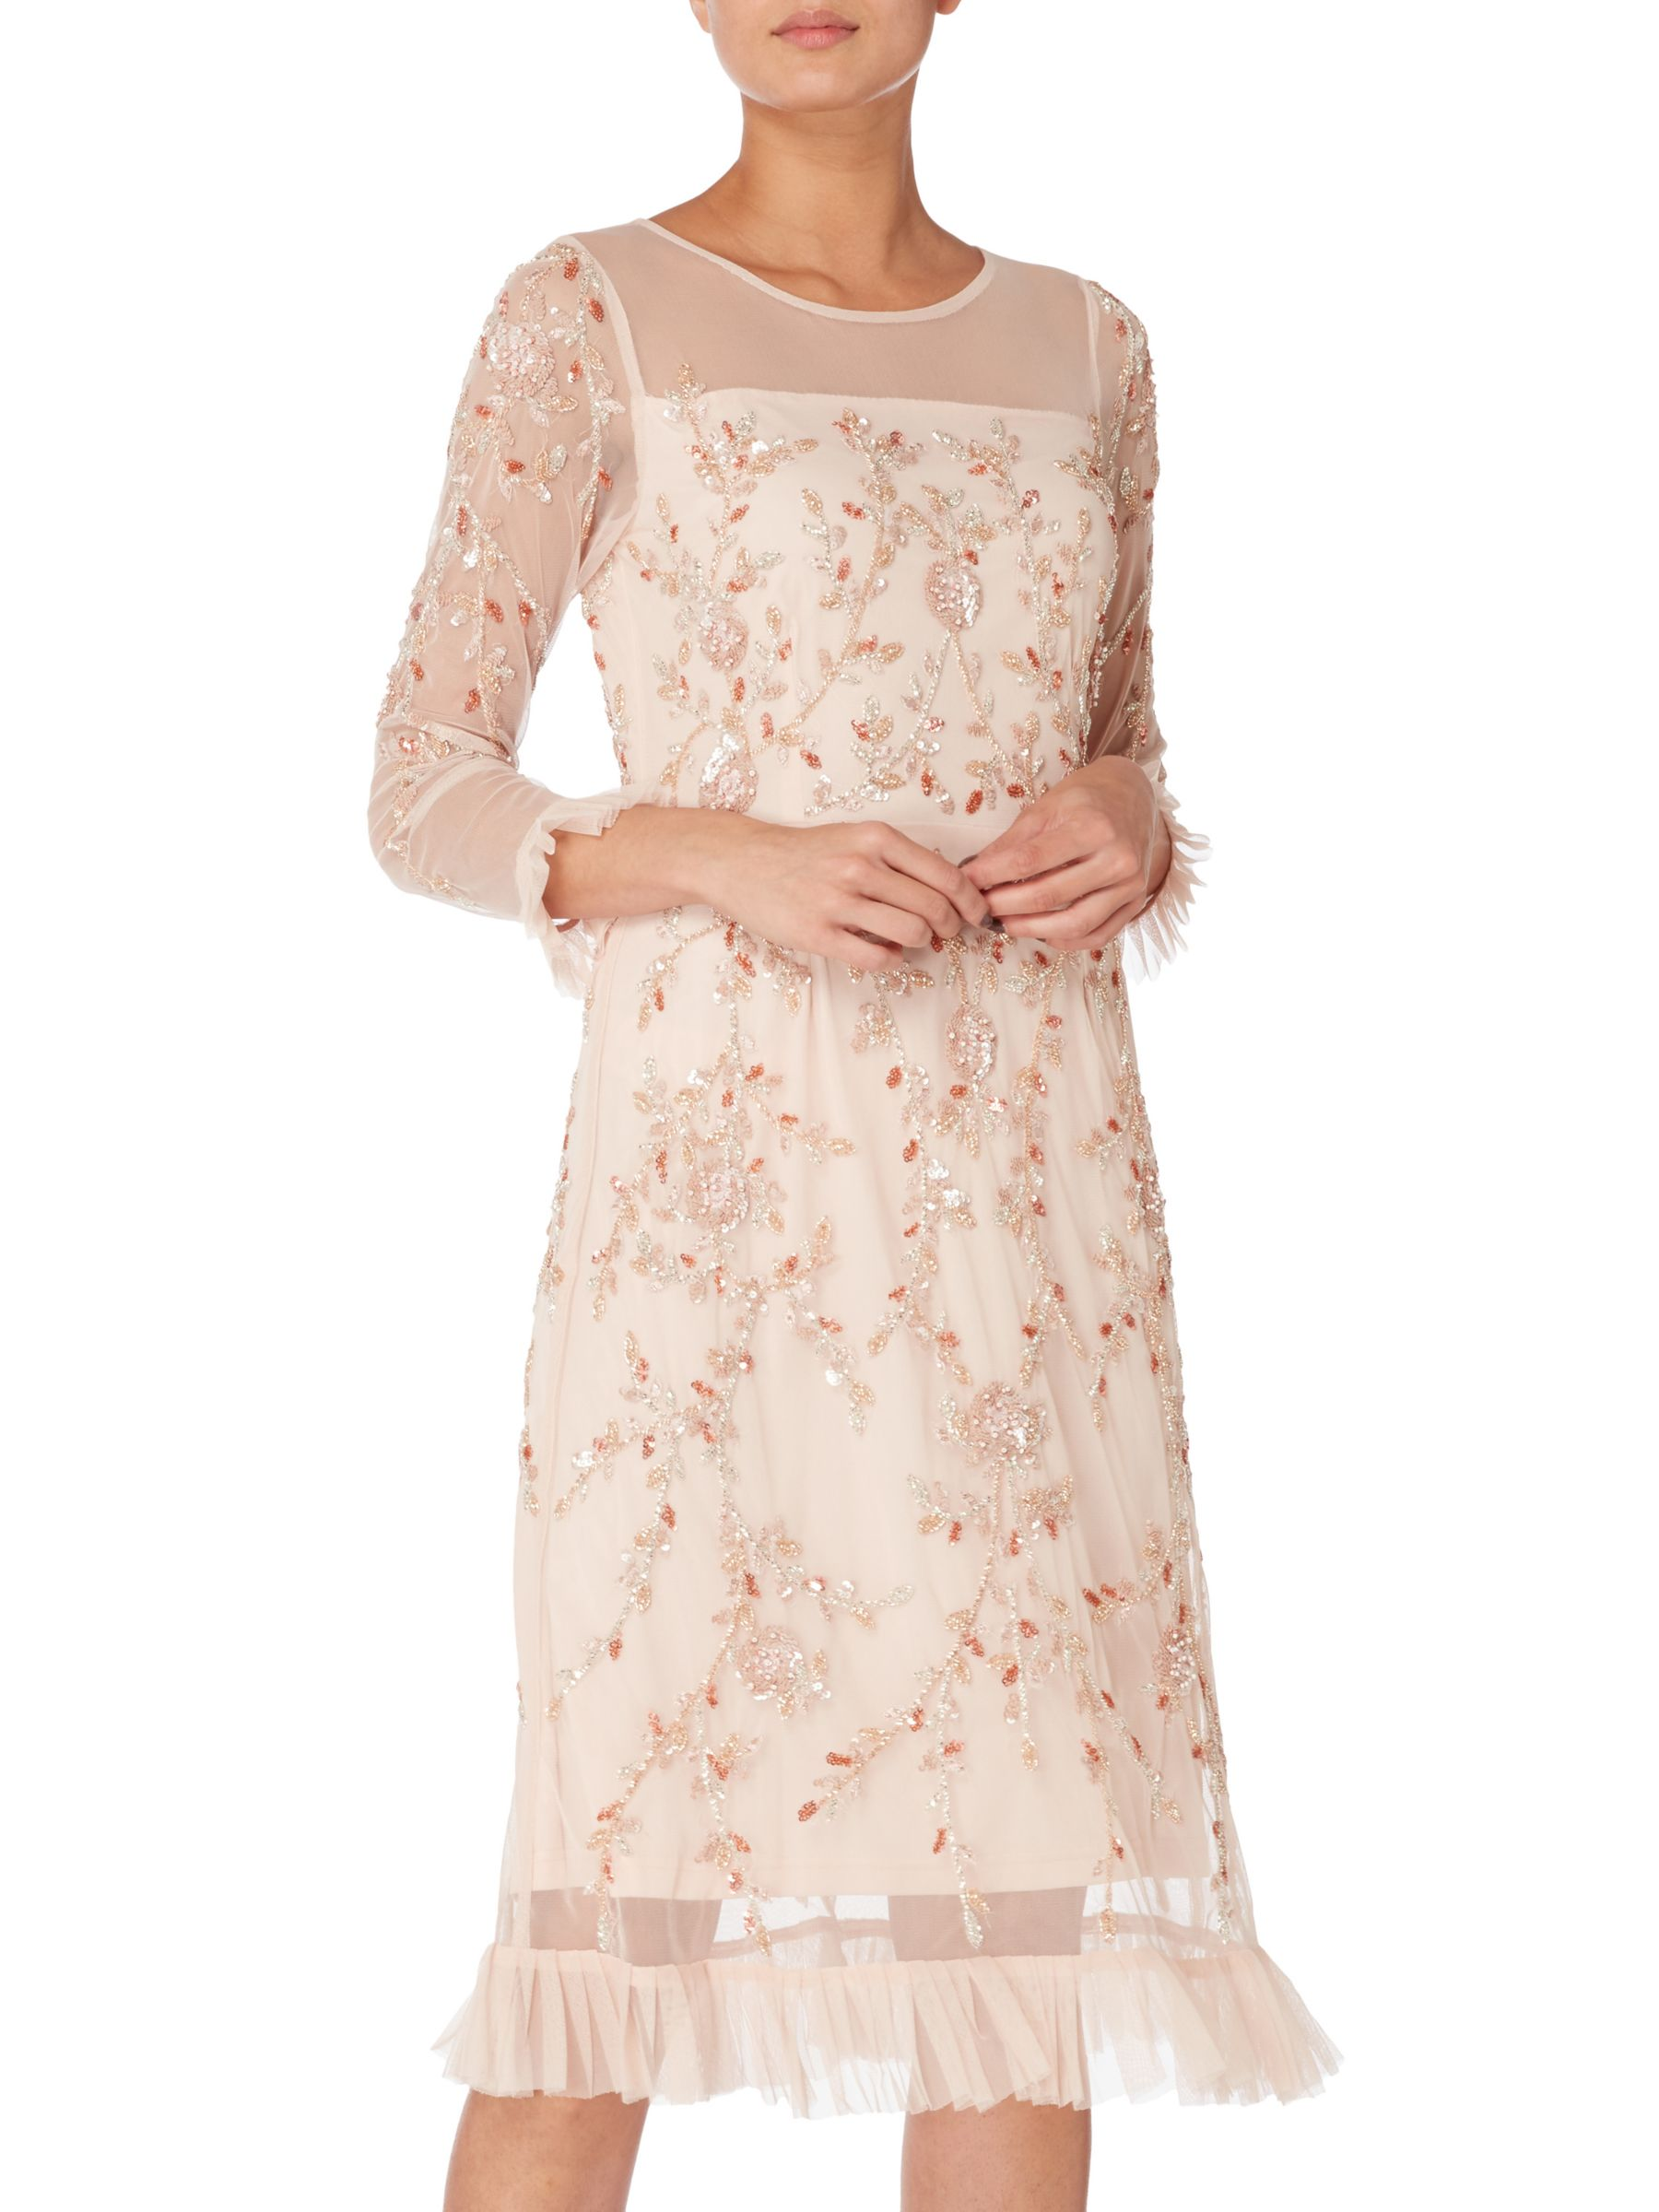 RAISHMA Raishma Floral Embellished Frill Dress, Blush